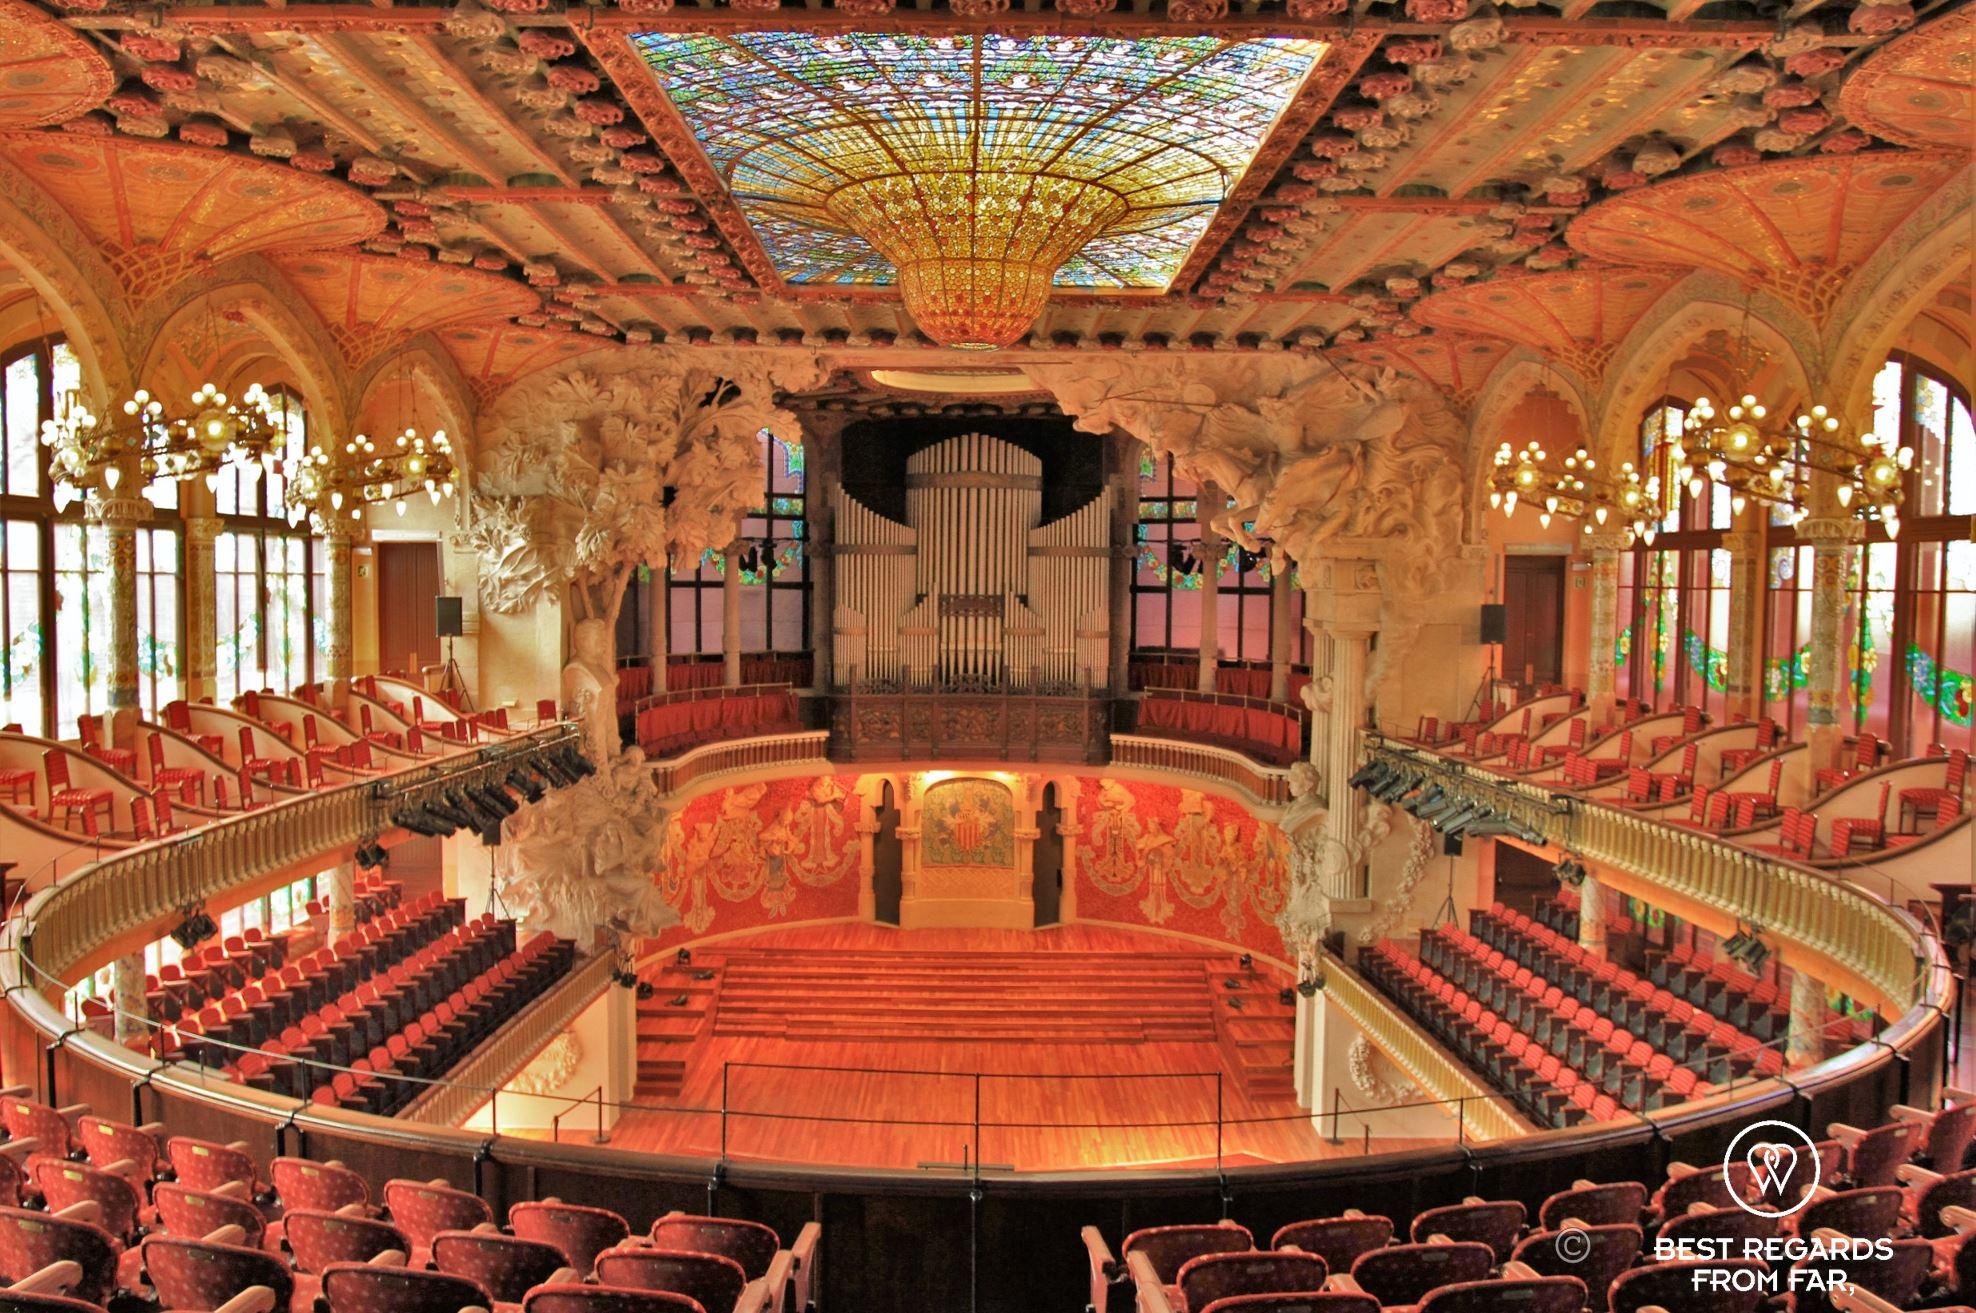 Palau De La Musica Catalana Barcelona 4 Best Regards From Far